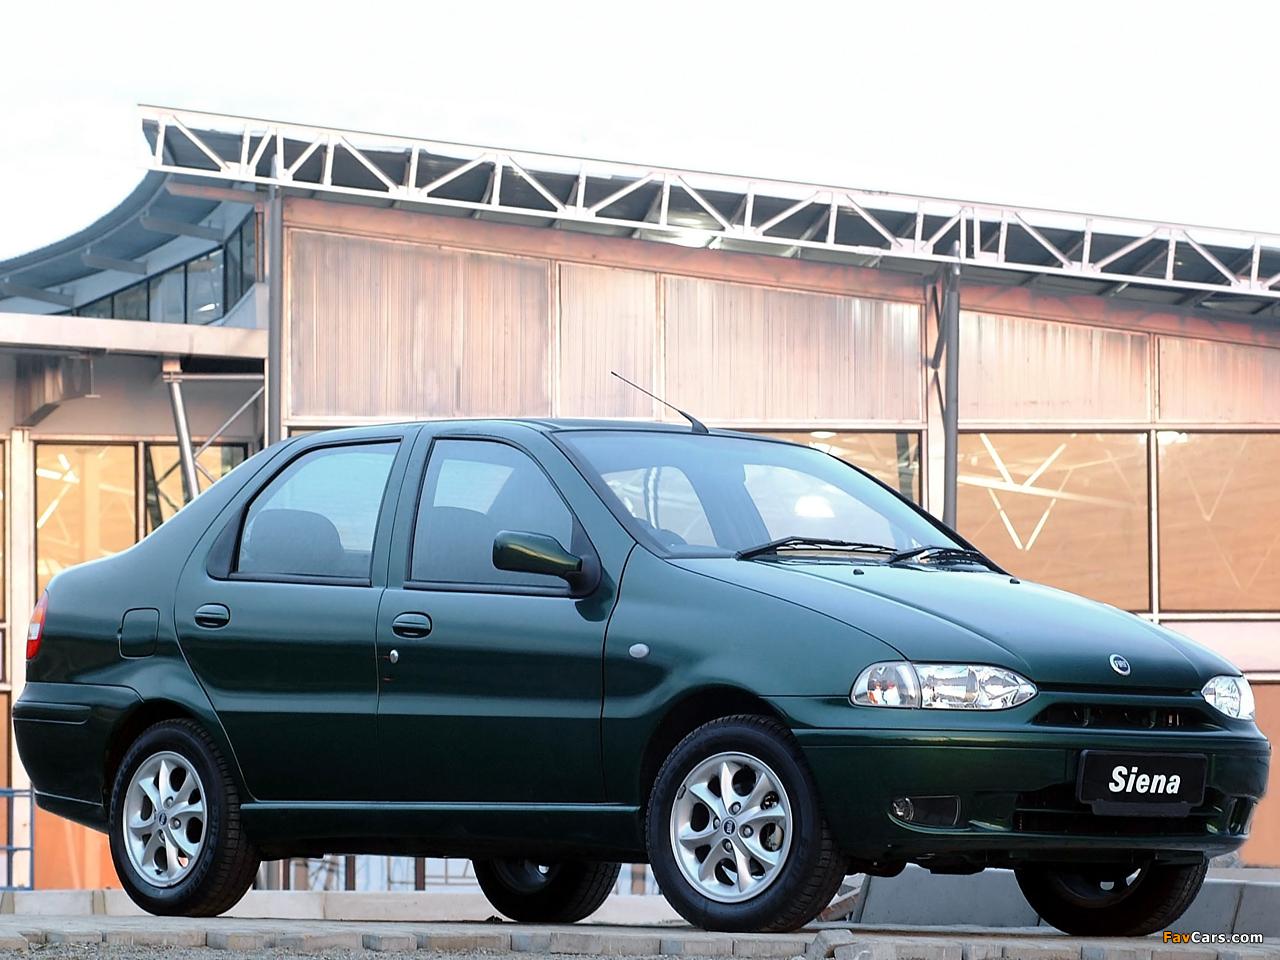 Fiat Siena ZA-spec (178) 2002–05 pictures (1280 x 960)